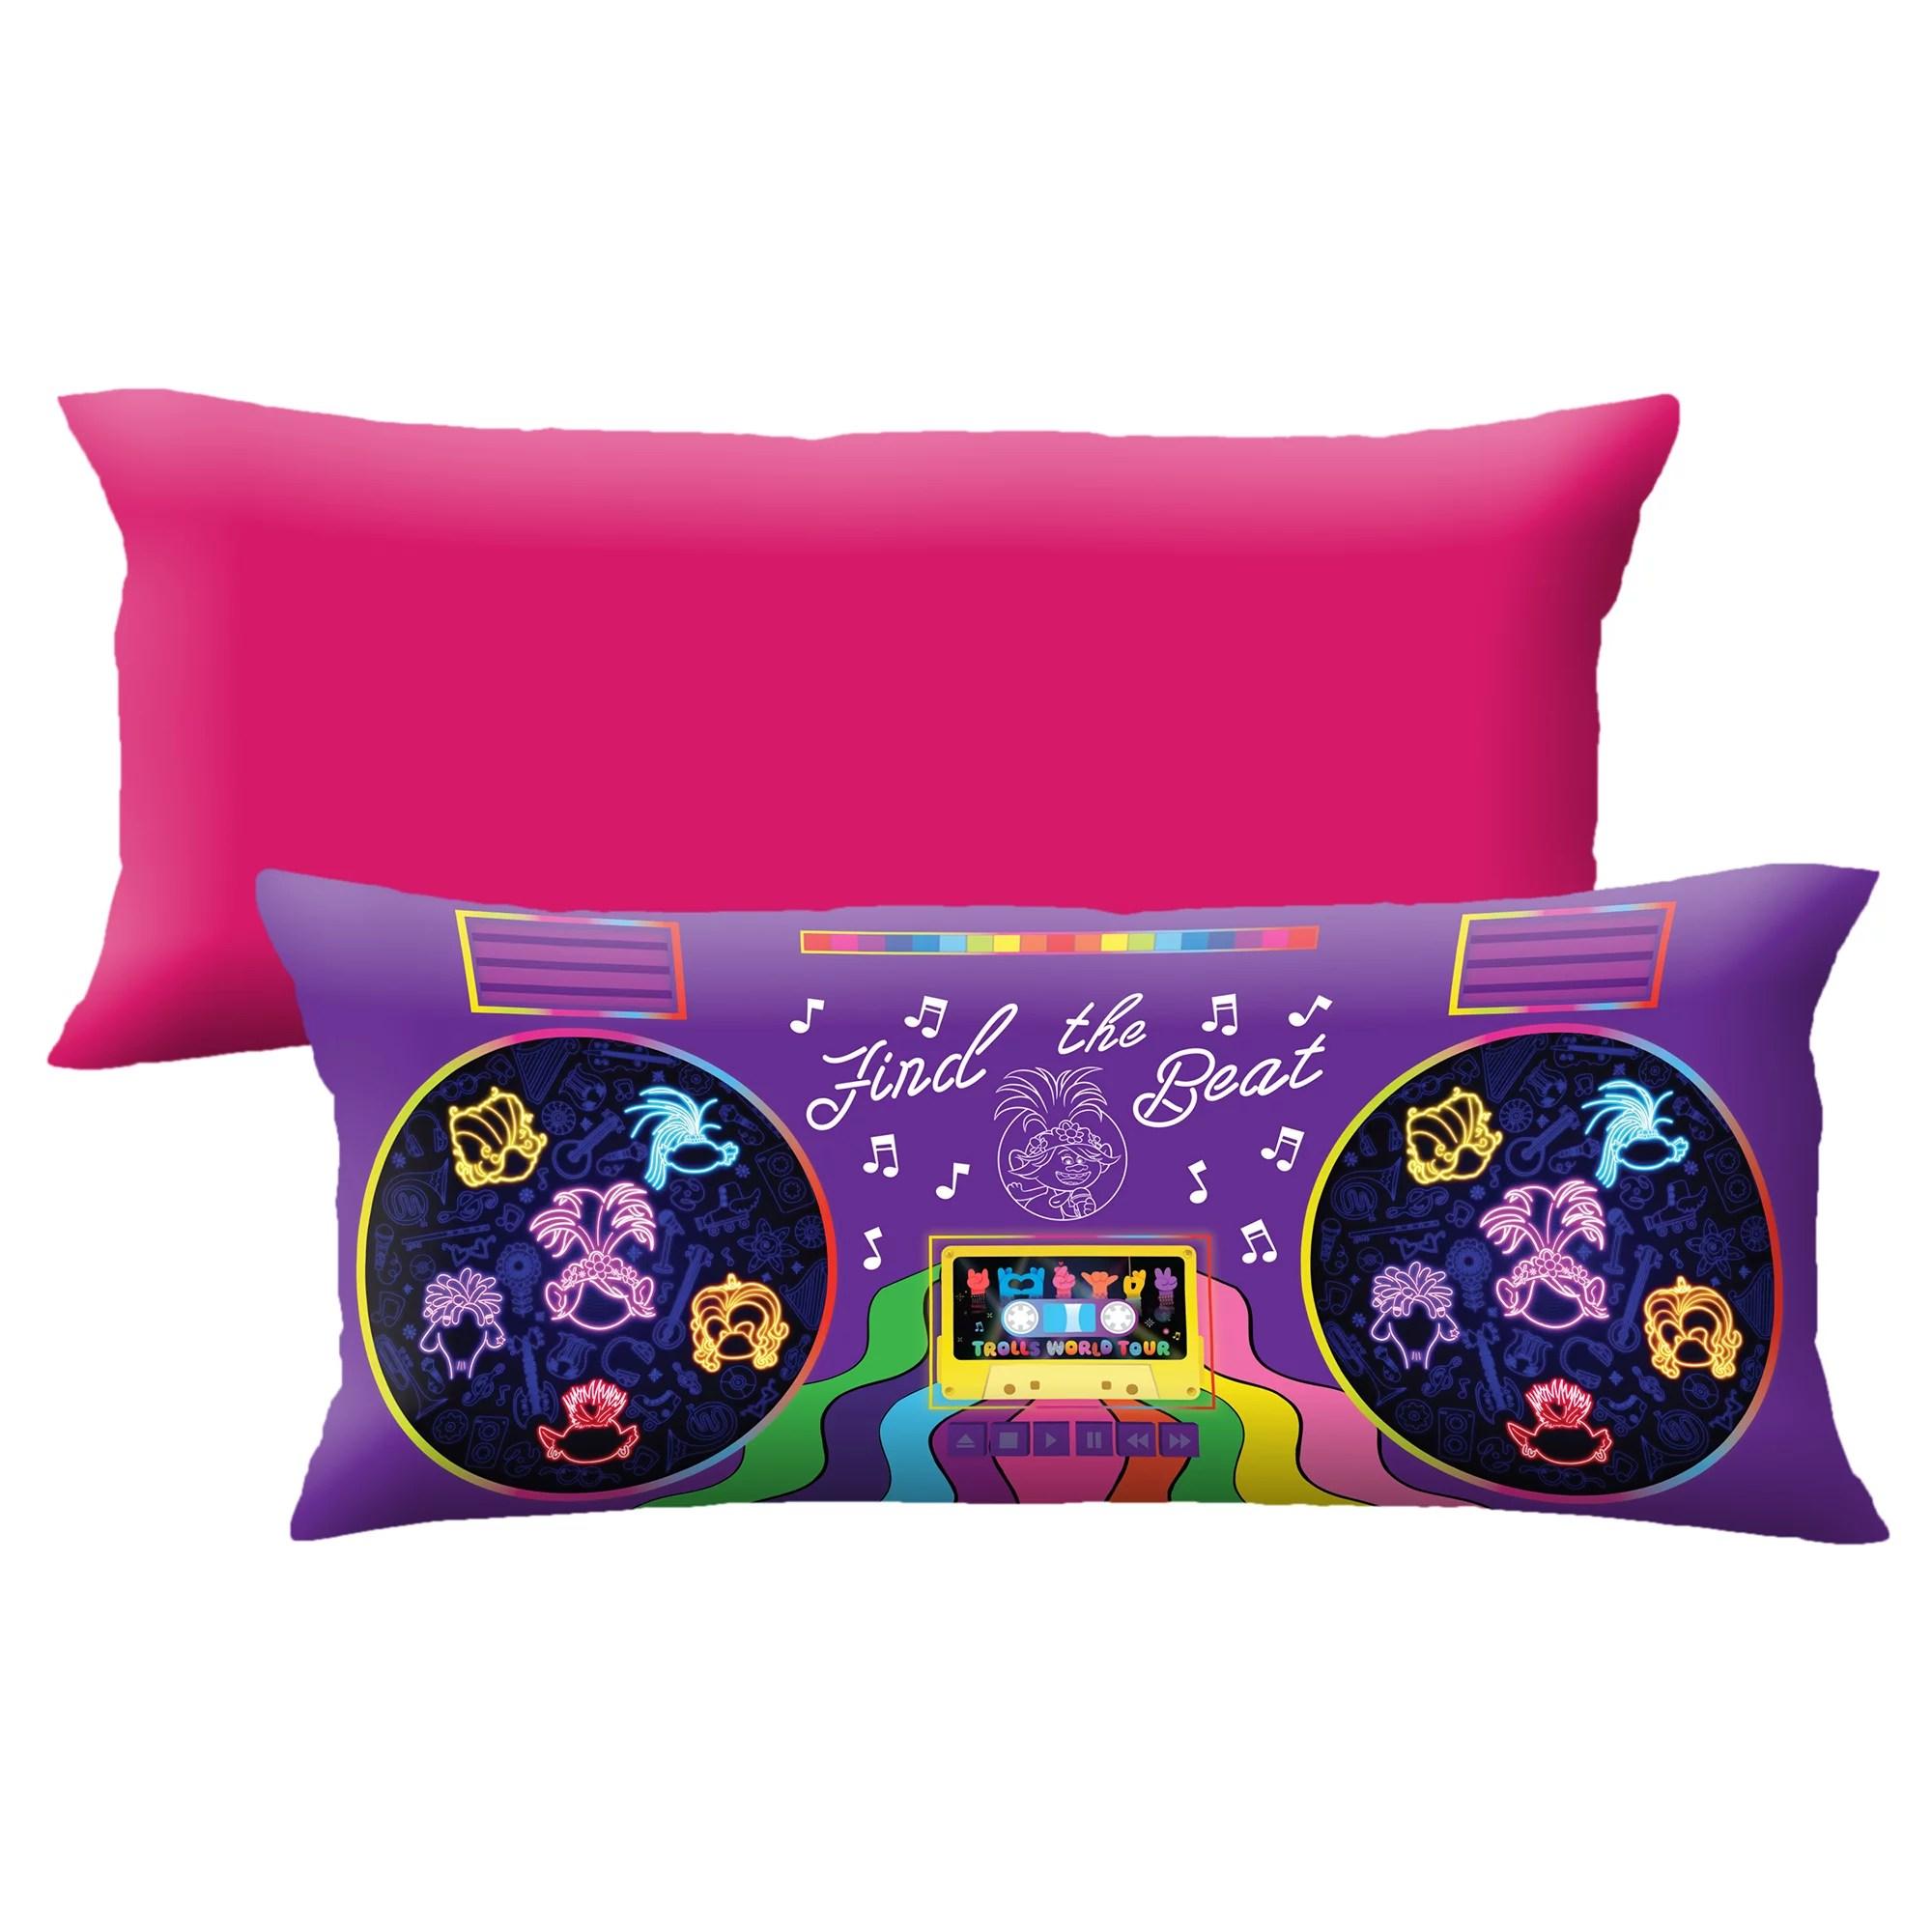 trolls world tour extra large body pillow glow in the dark 4 ft long walmart com